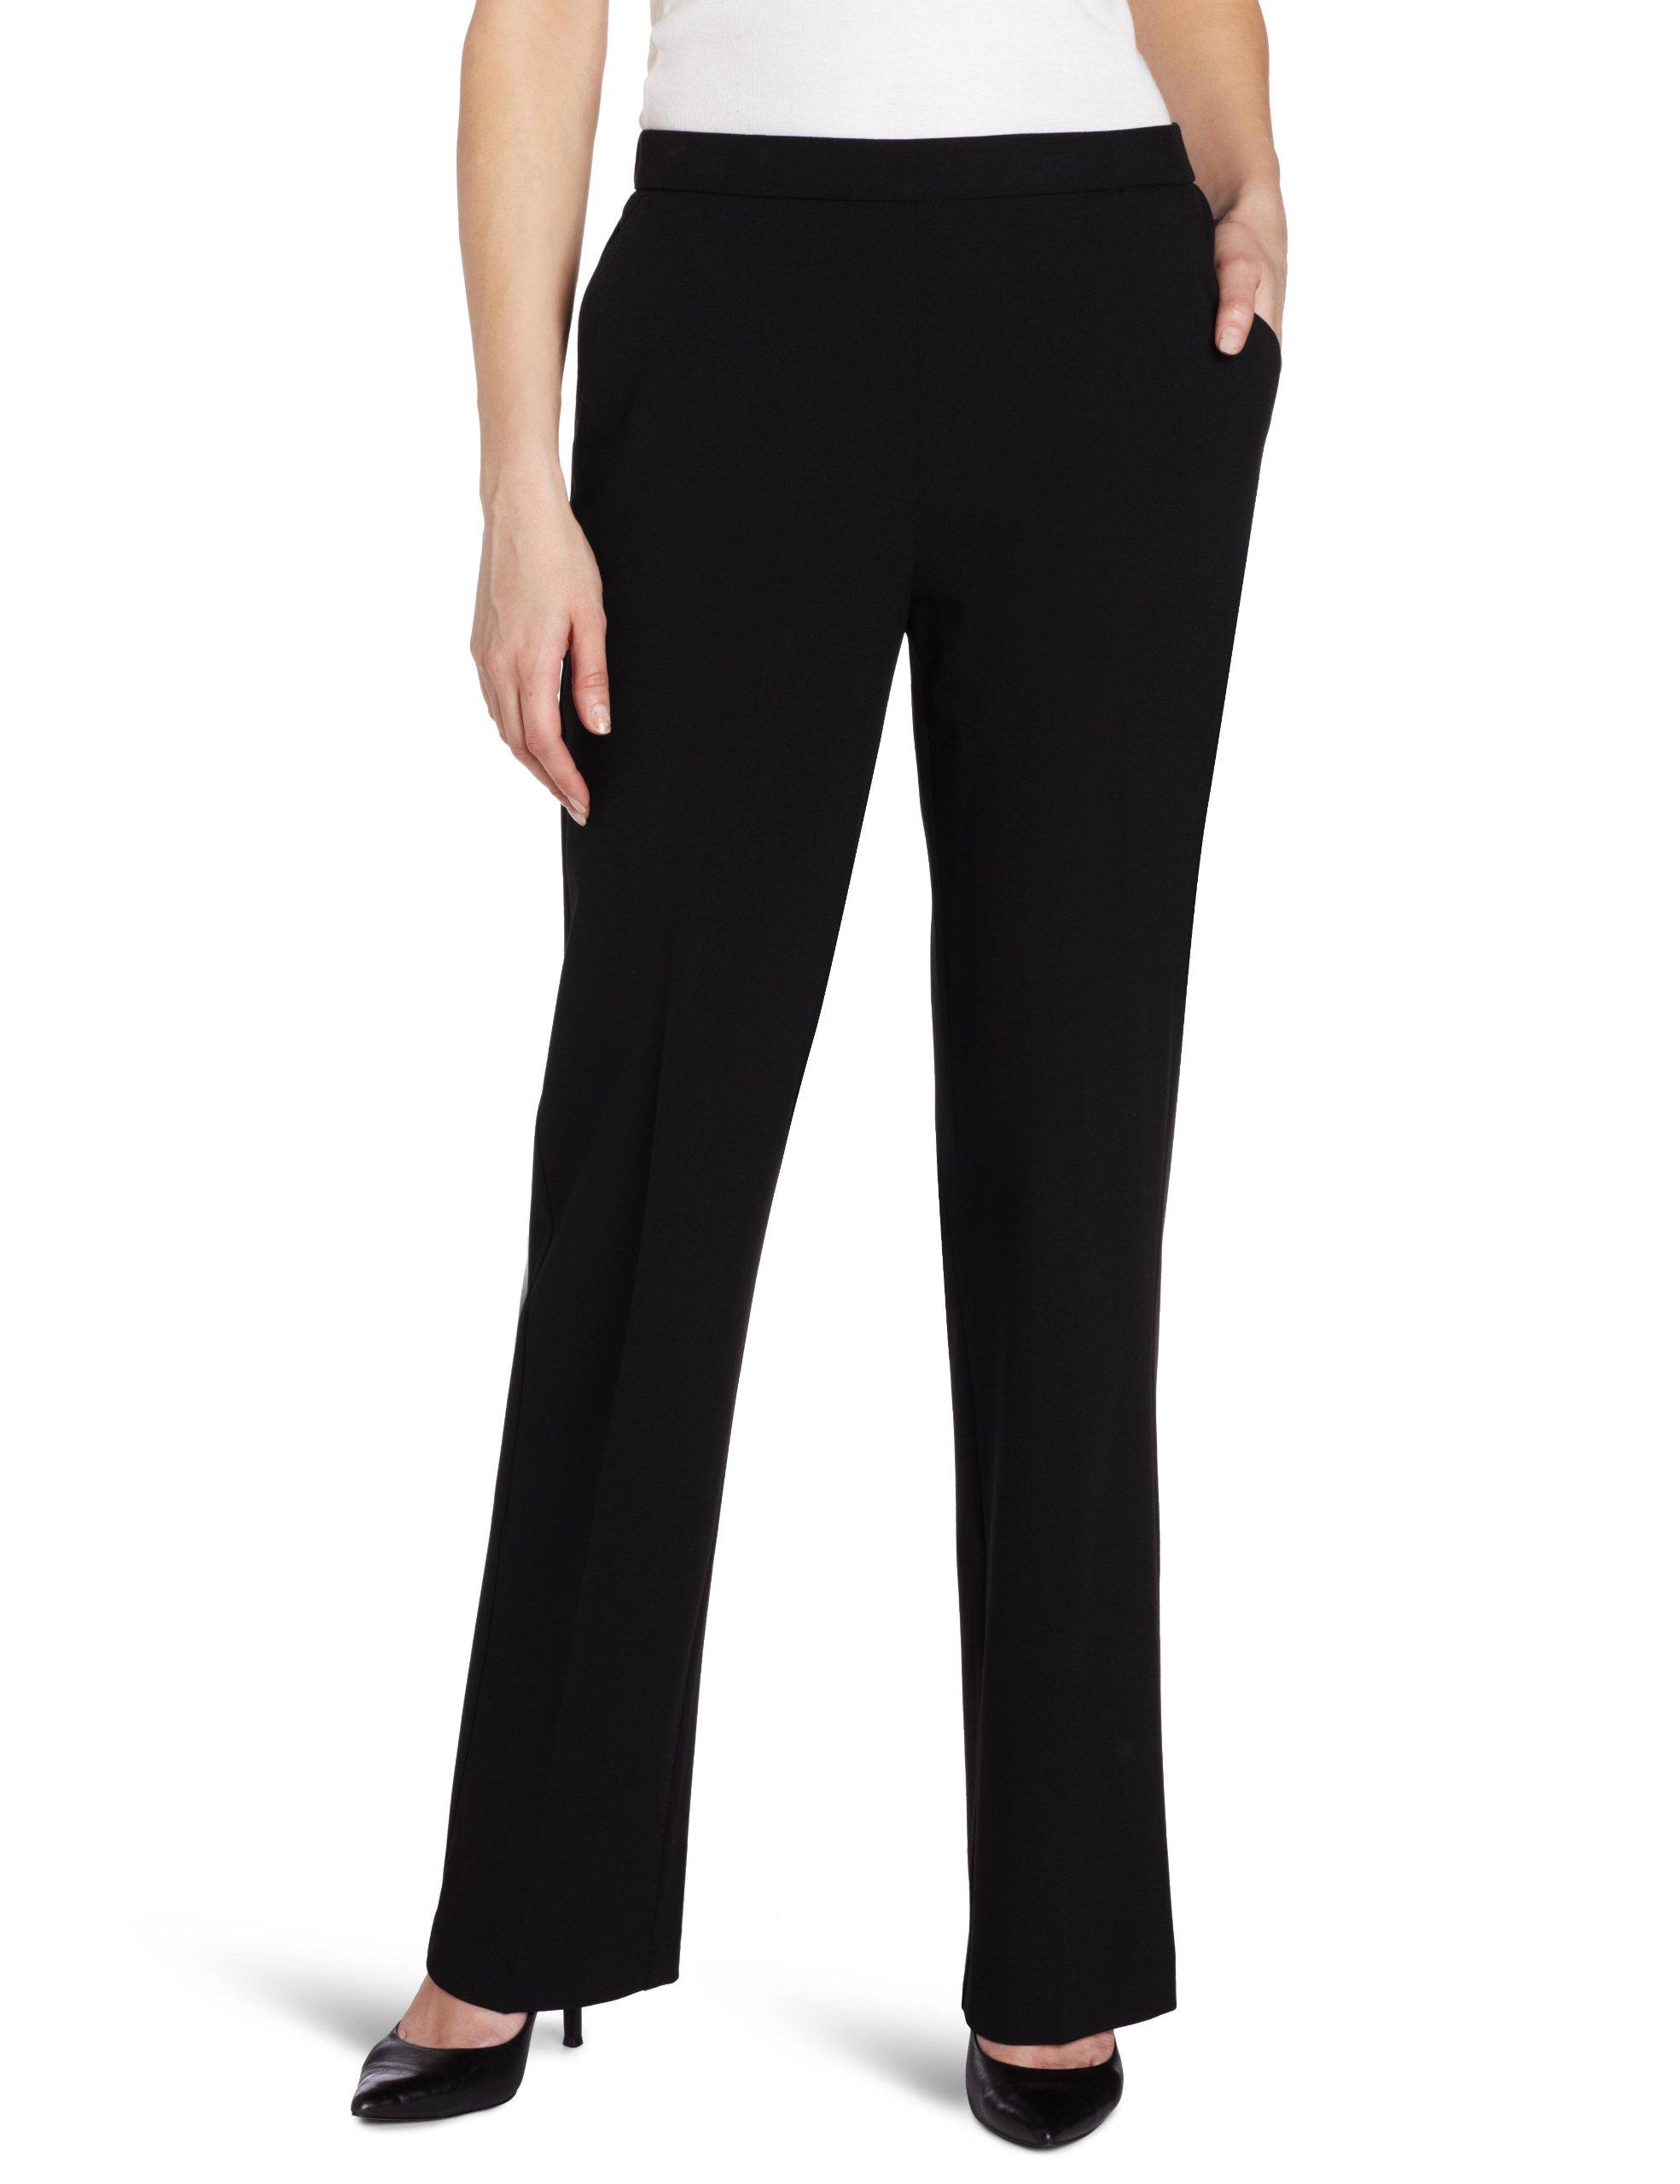 Briggs New York Women's Short Flat Front Pant, Black, 8